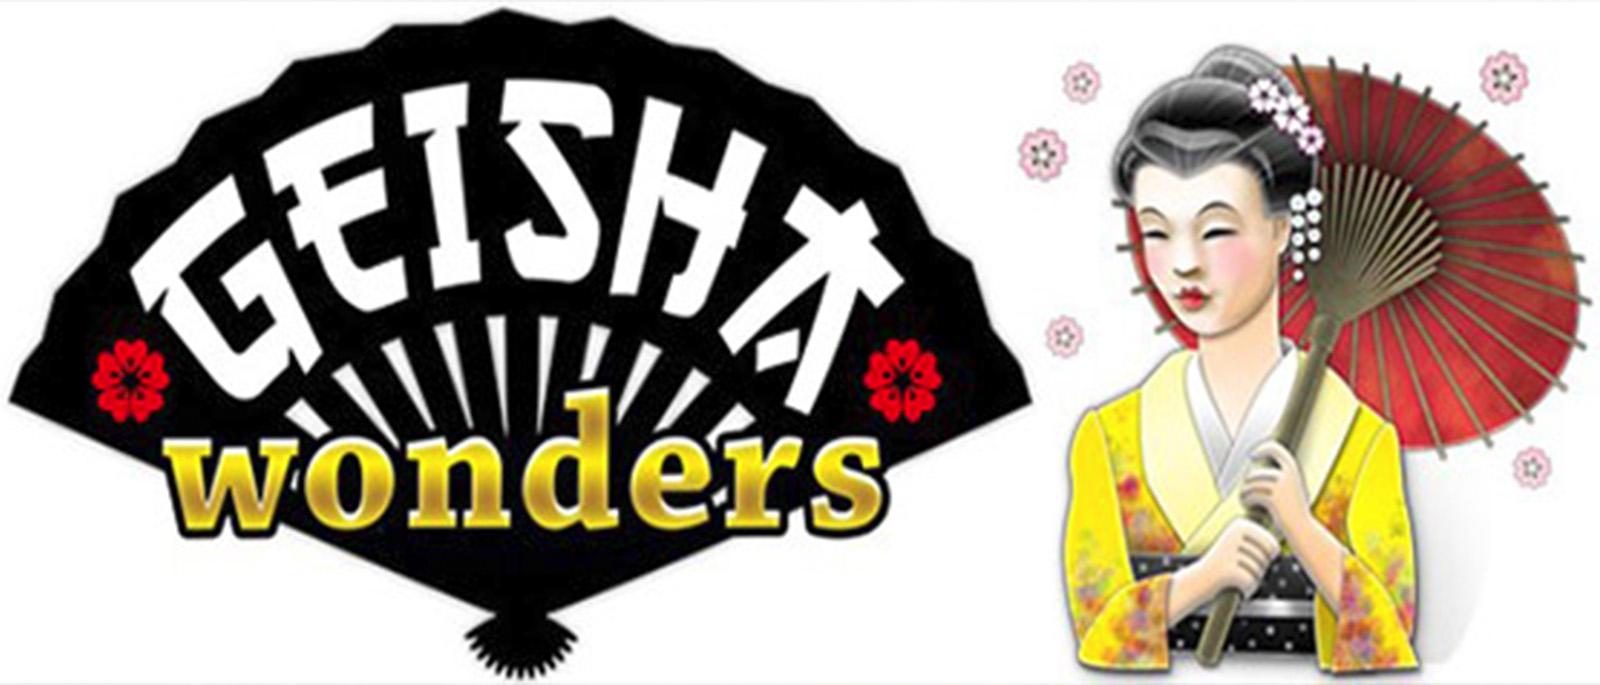 Geisha Wonders Slot Spiele